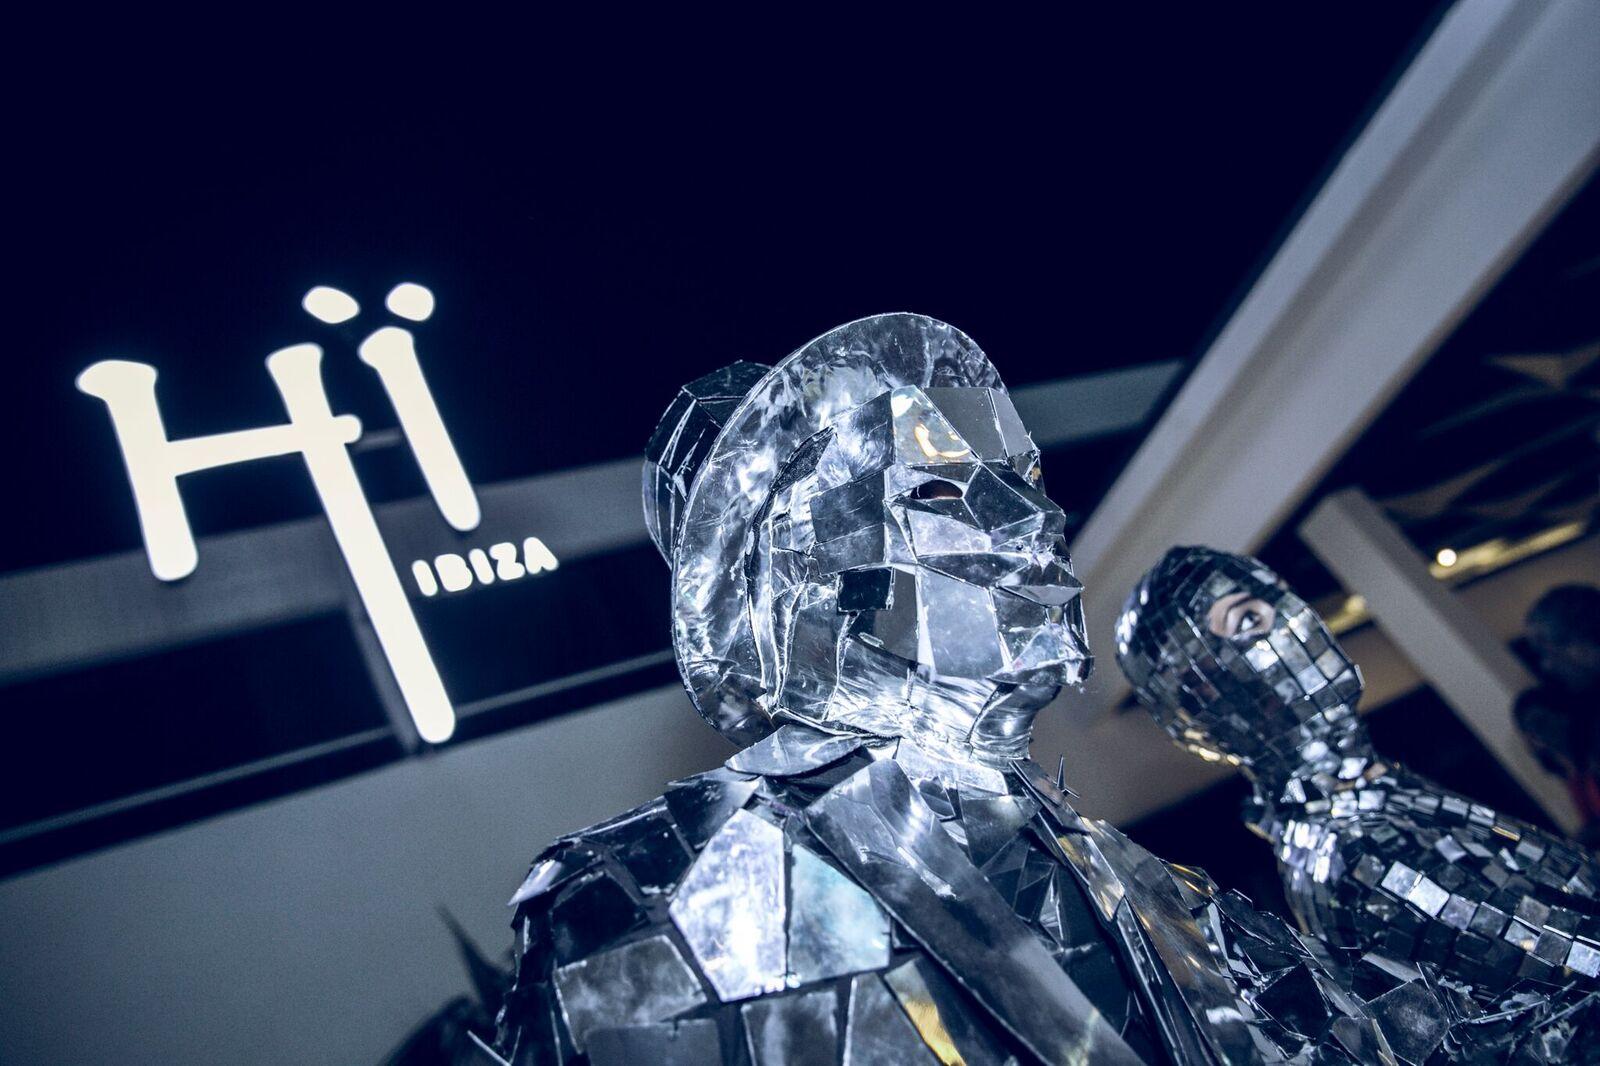 Glitterbox de retour au Hï Ibiza en 2018